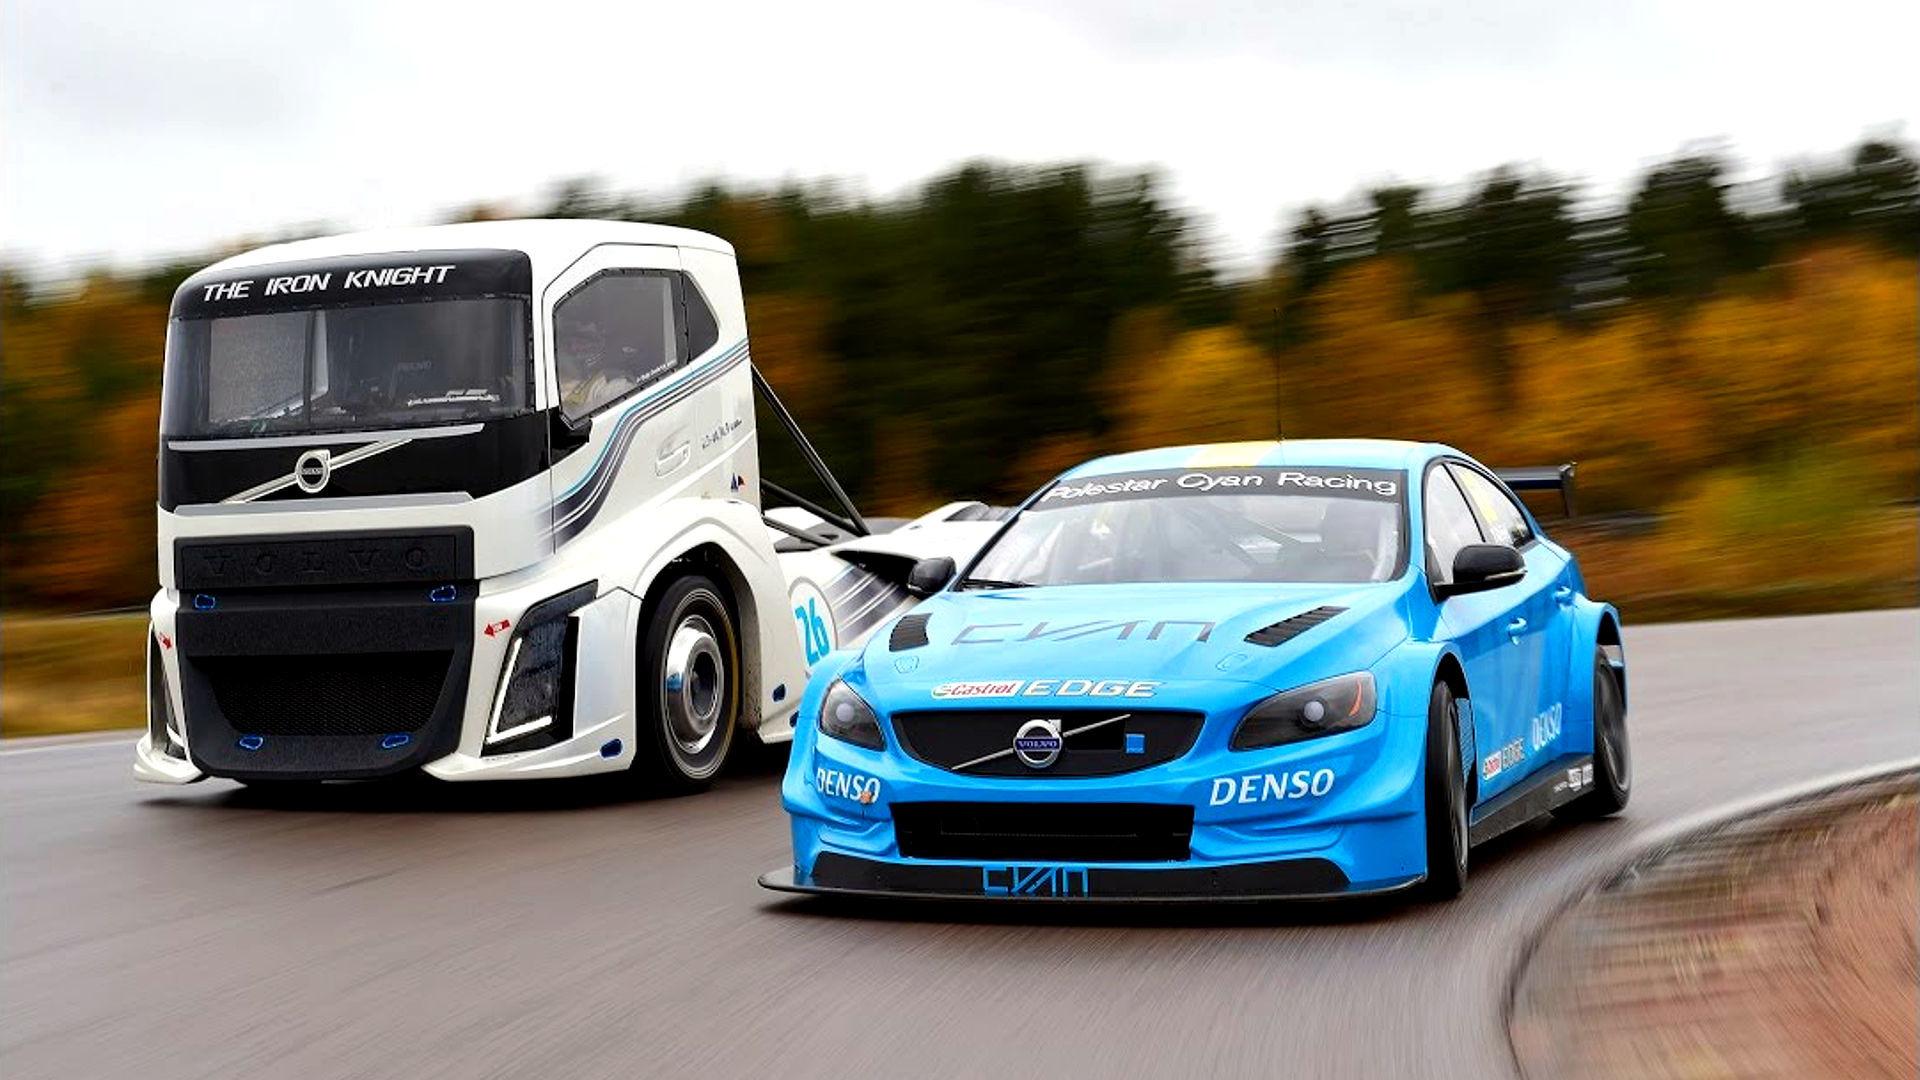 Volvo\'s 2,400-hp semi truck and S60 Polestar race car go head-to-head